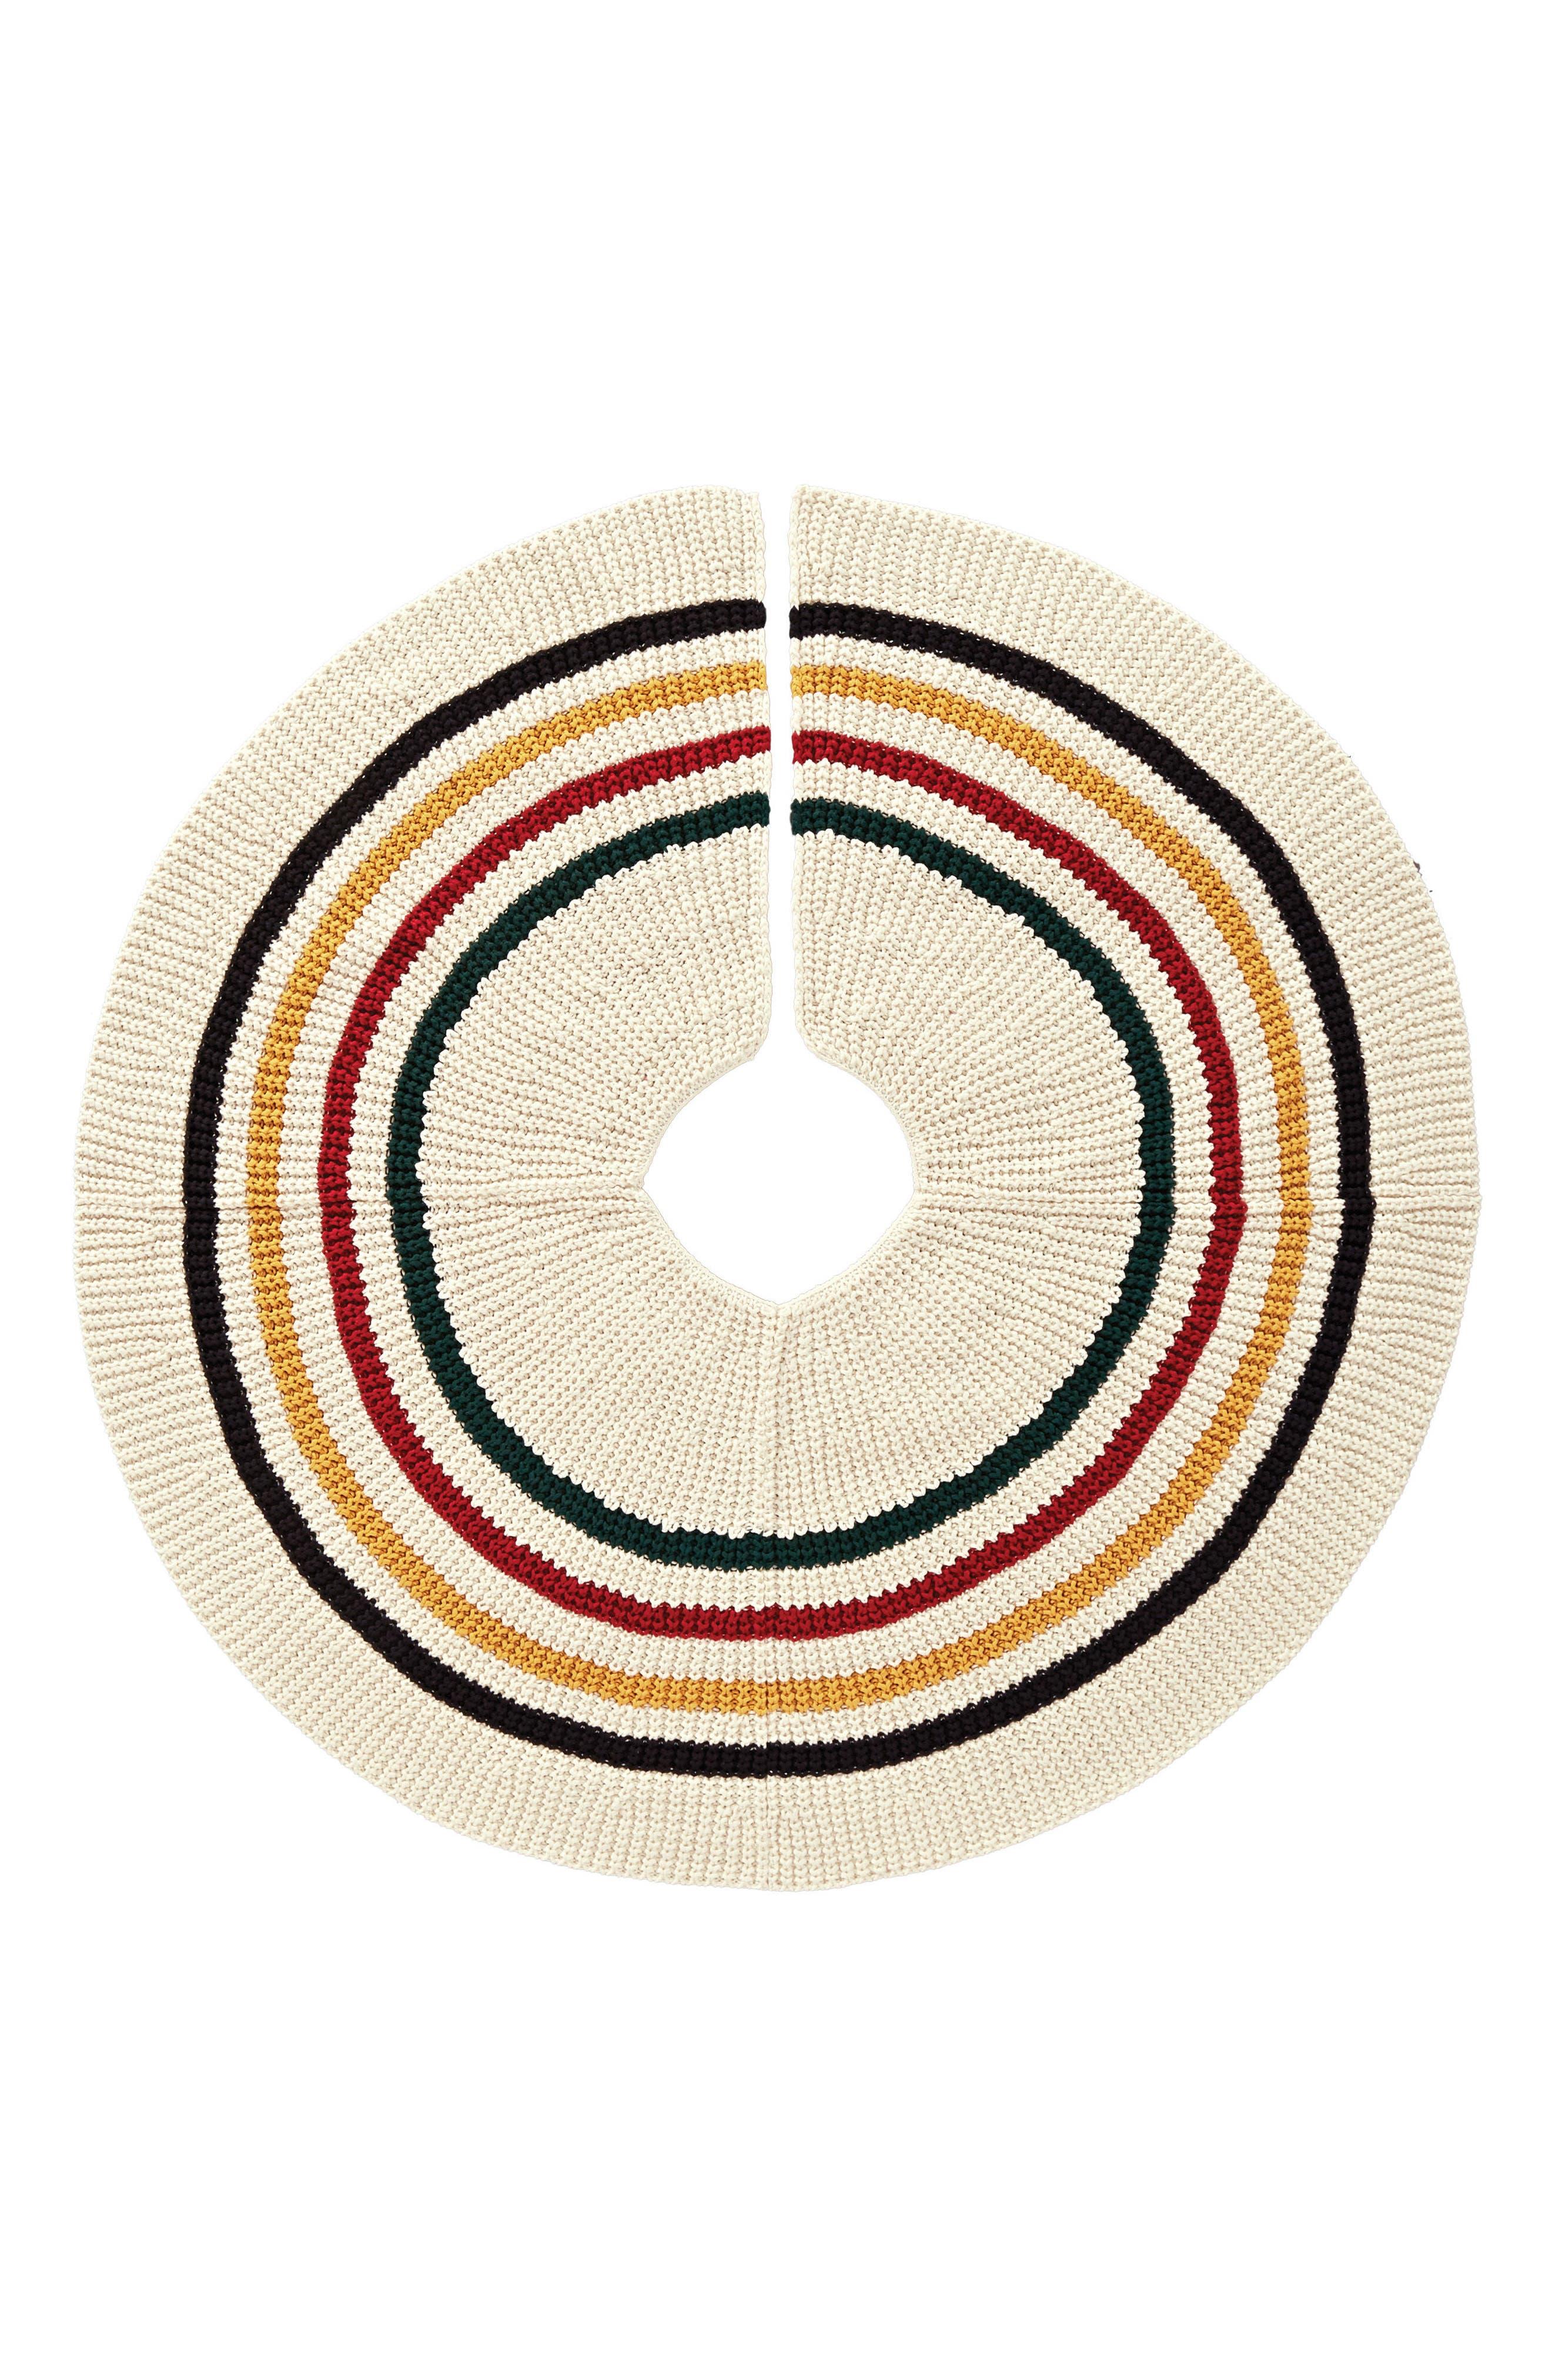 Alternate Image 1 Selected - Pendleton Glacier Park Knit Tree Skirt